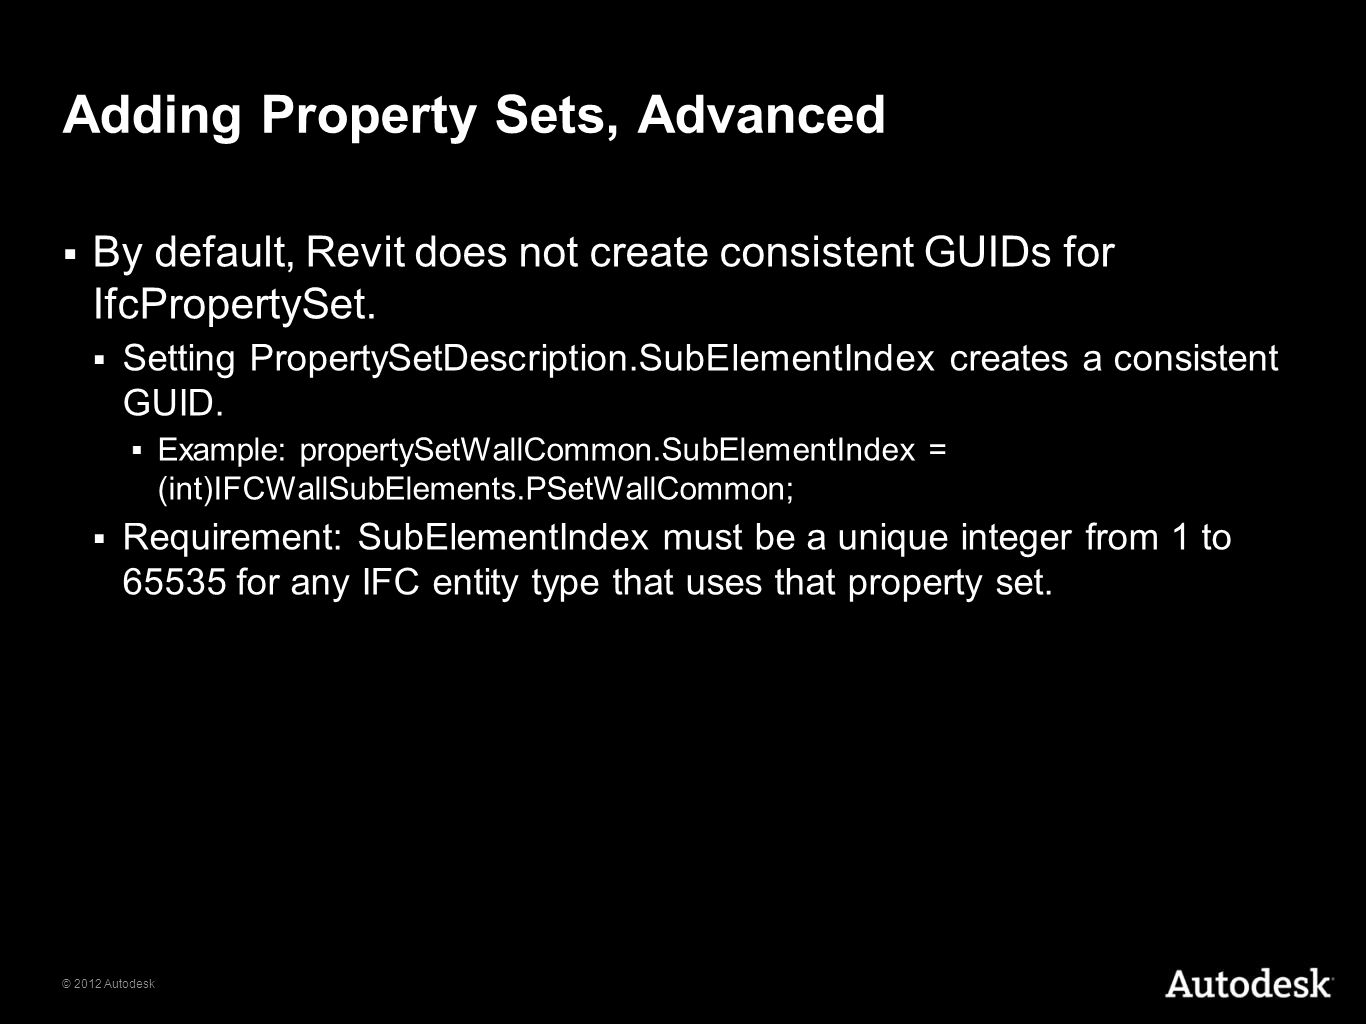 Adding Property Sets, Advanced